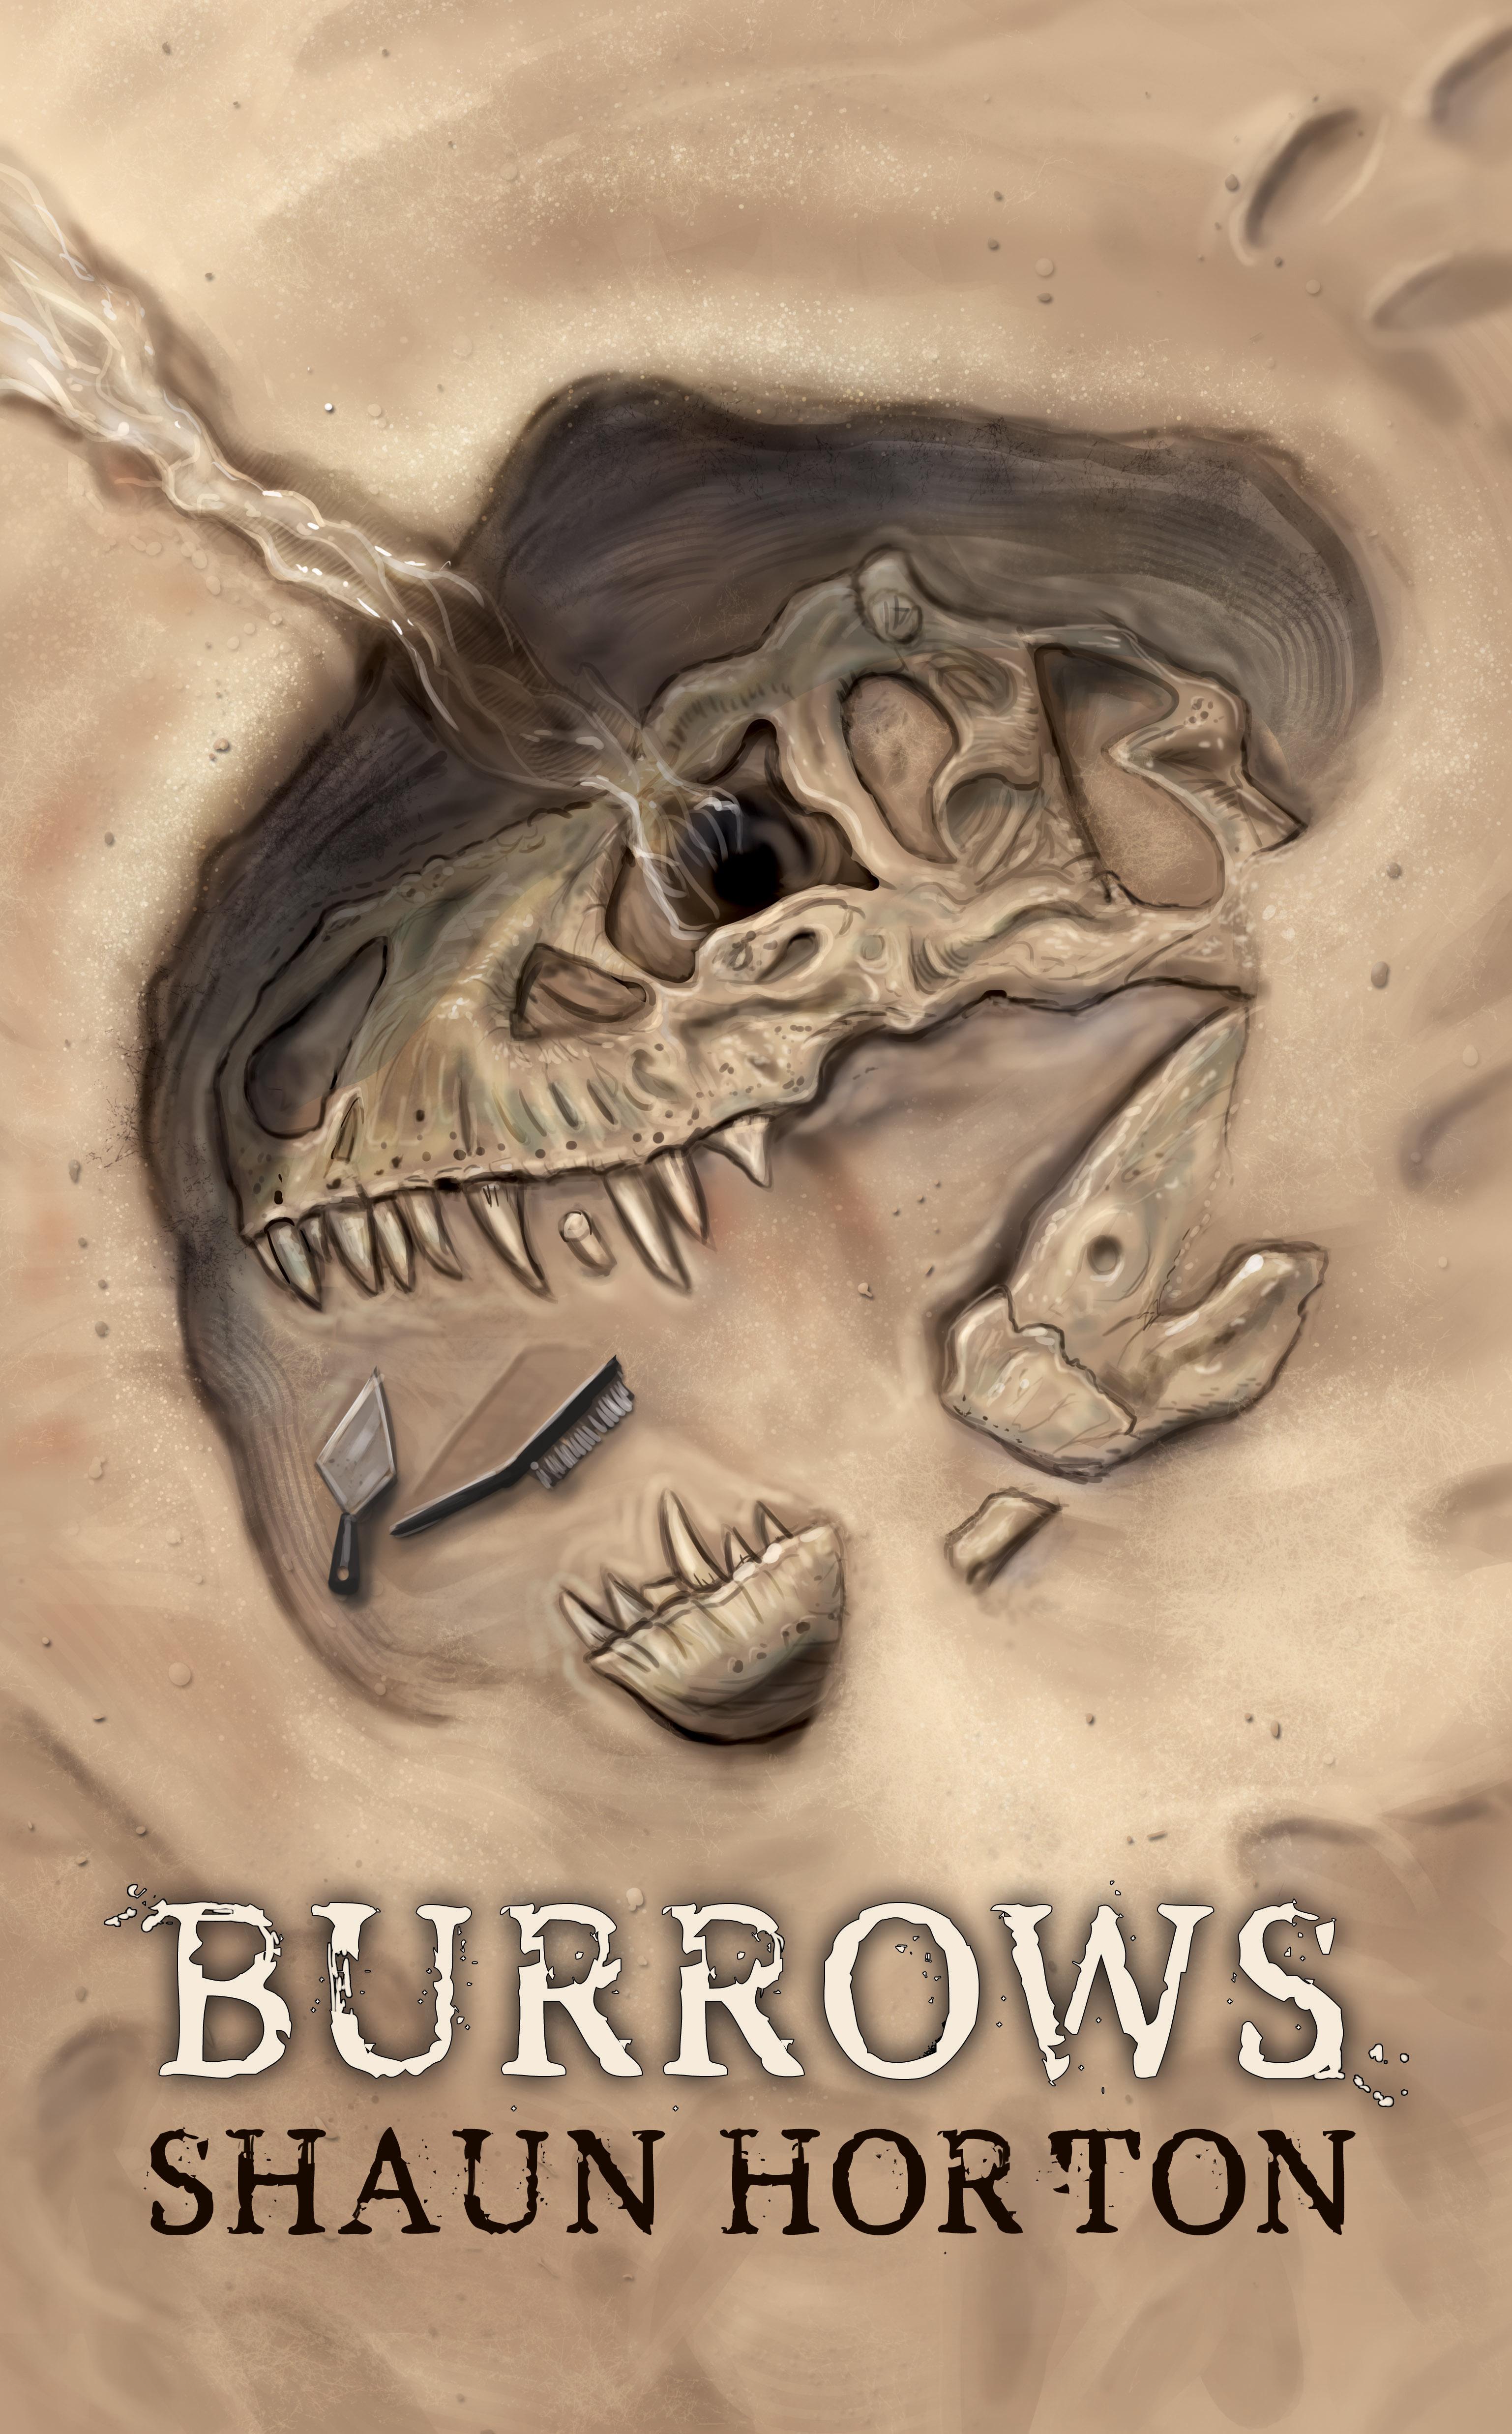 horror book cover, t rex, tyrannosaurus rex skull, Burrows by Shaun Horton